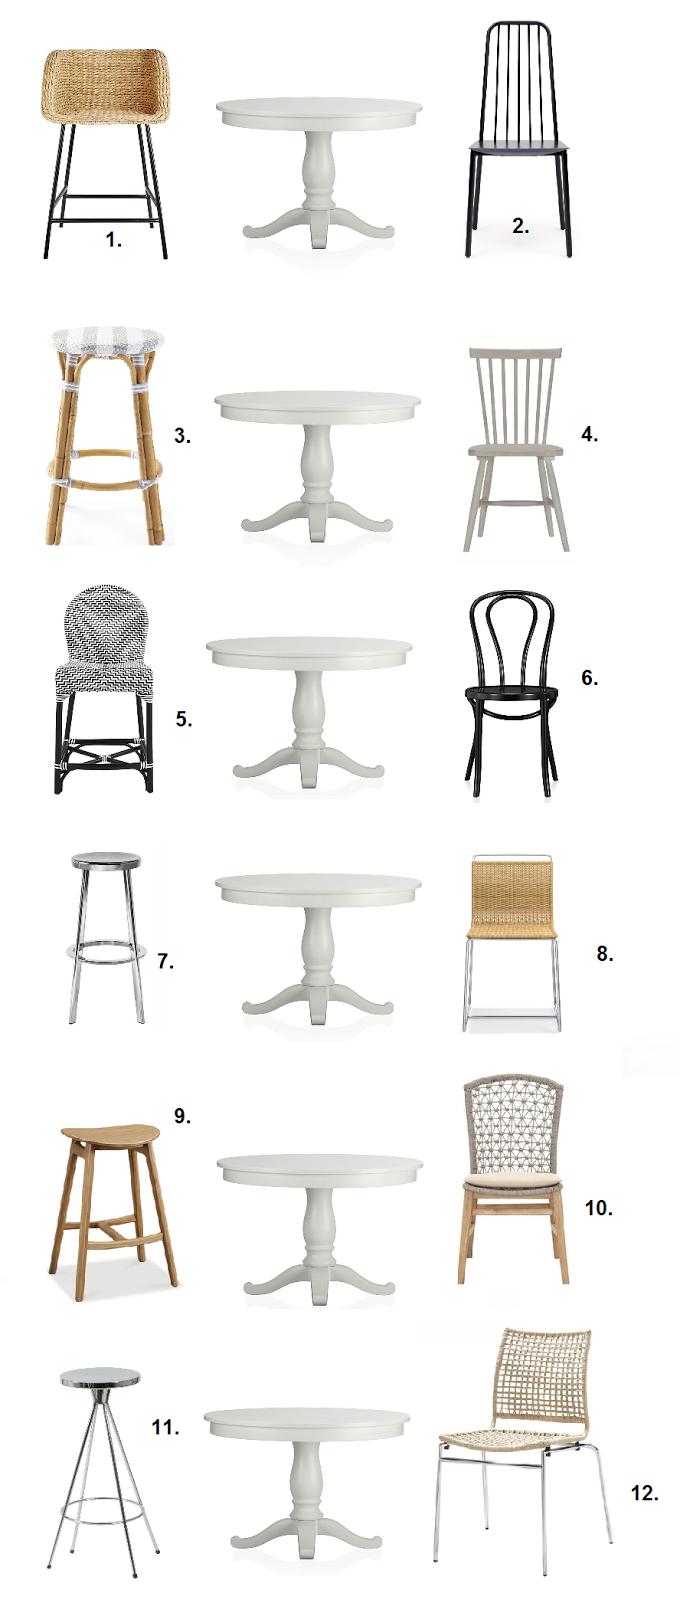 8FOOTSIX: Stools and Kitchen Chairs - Not Matchy Matchy